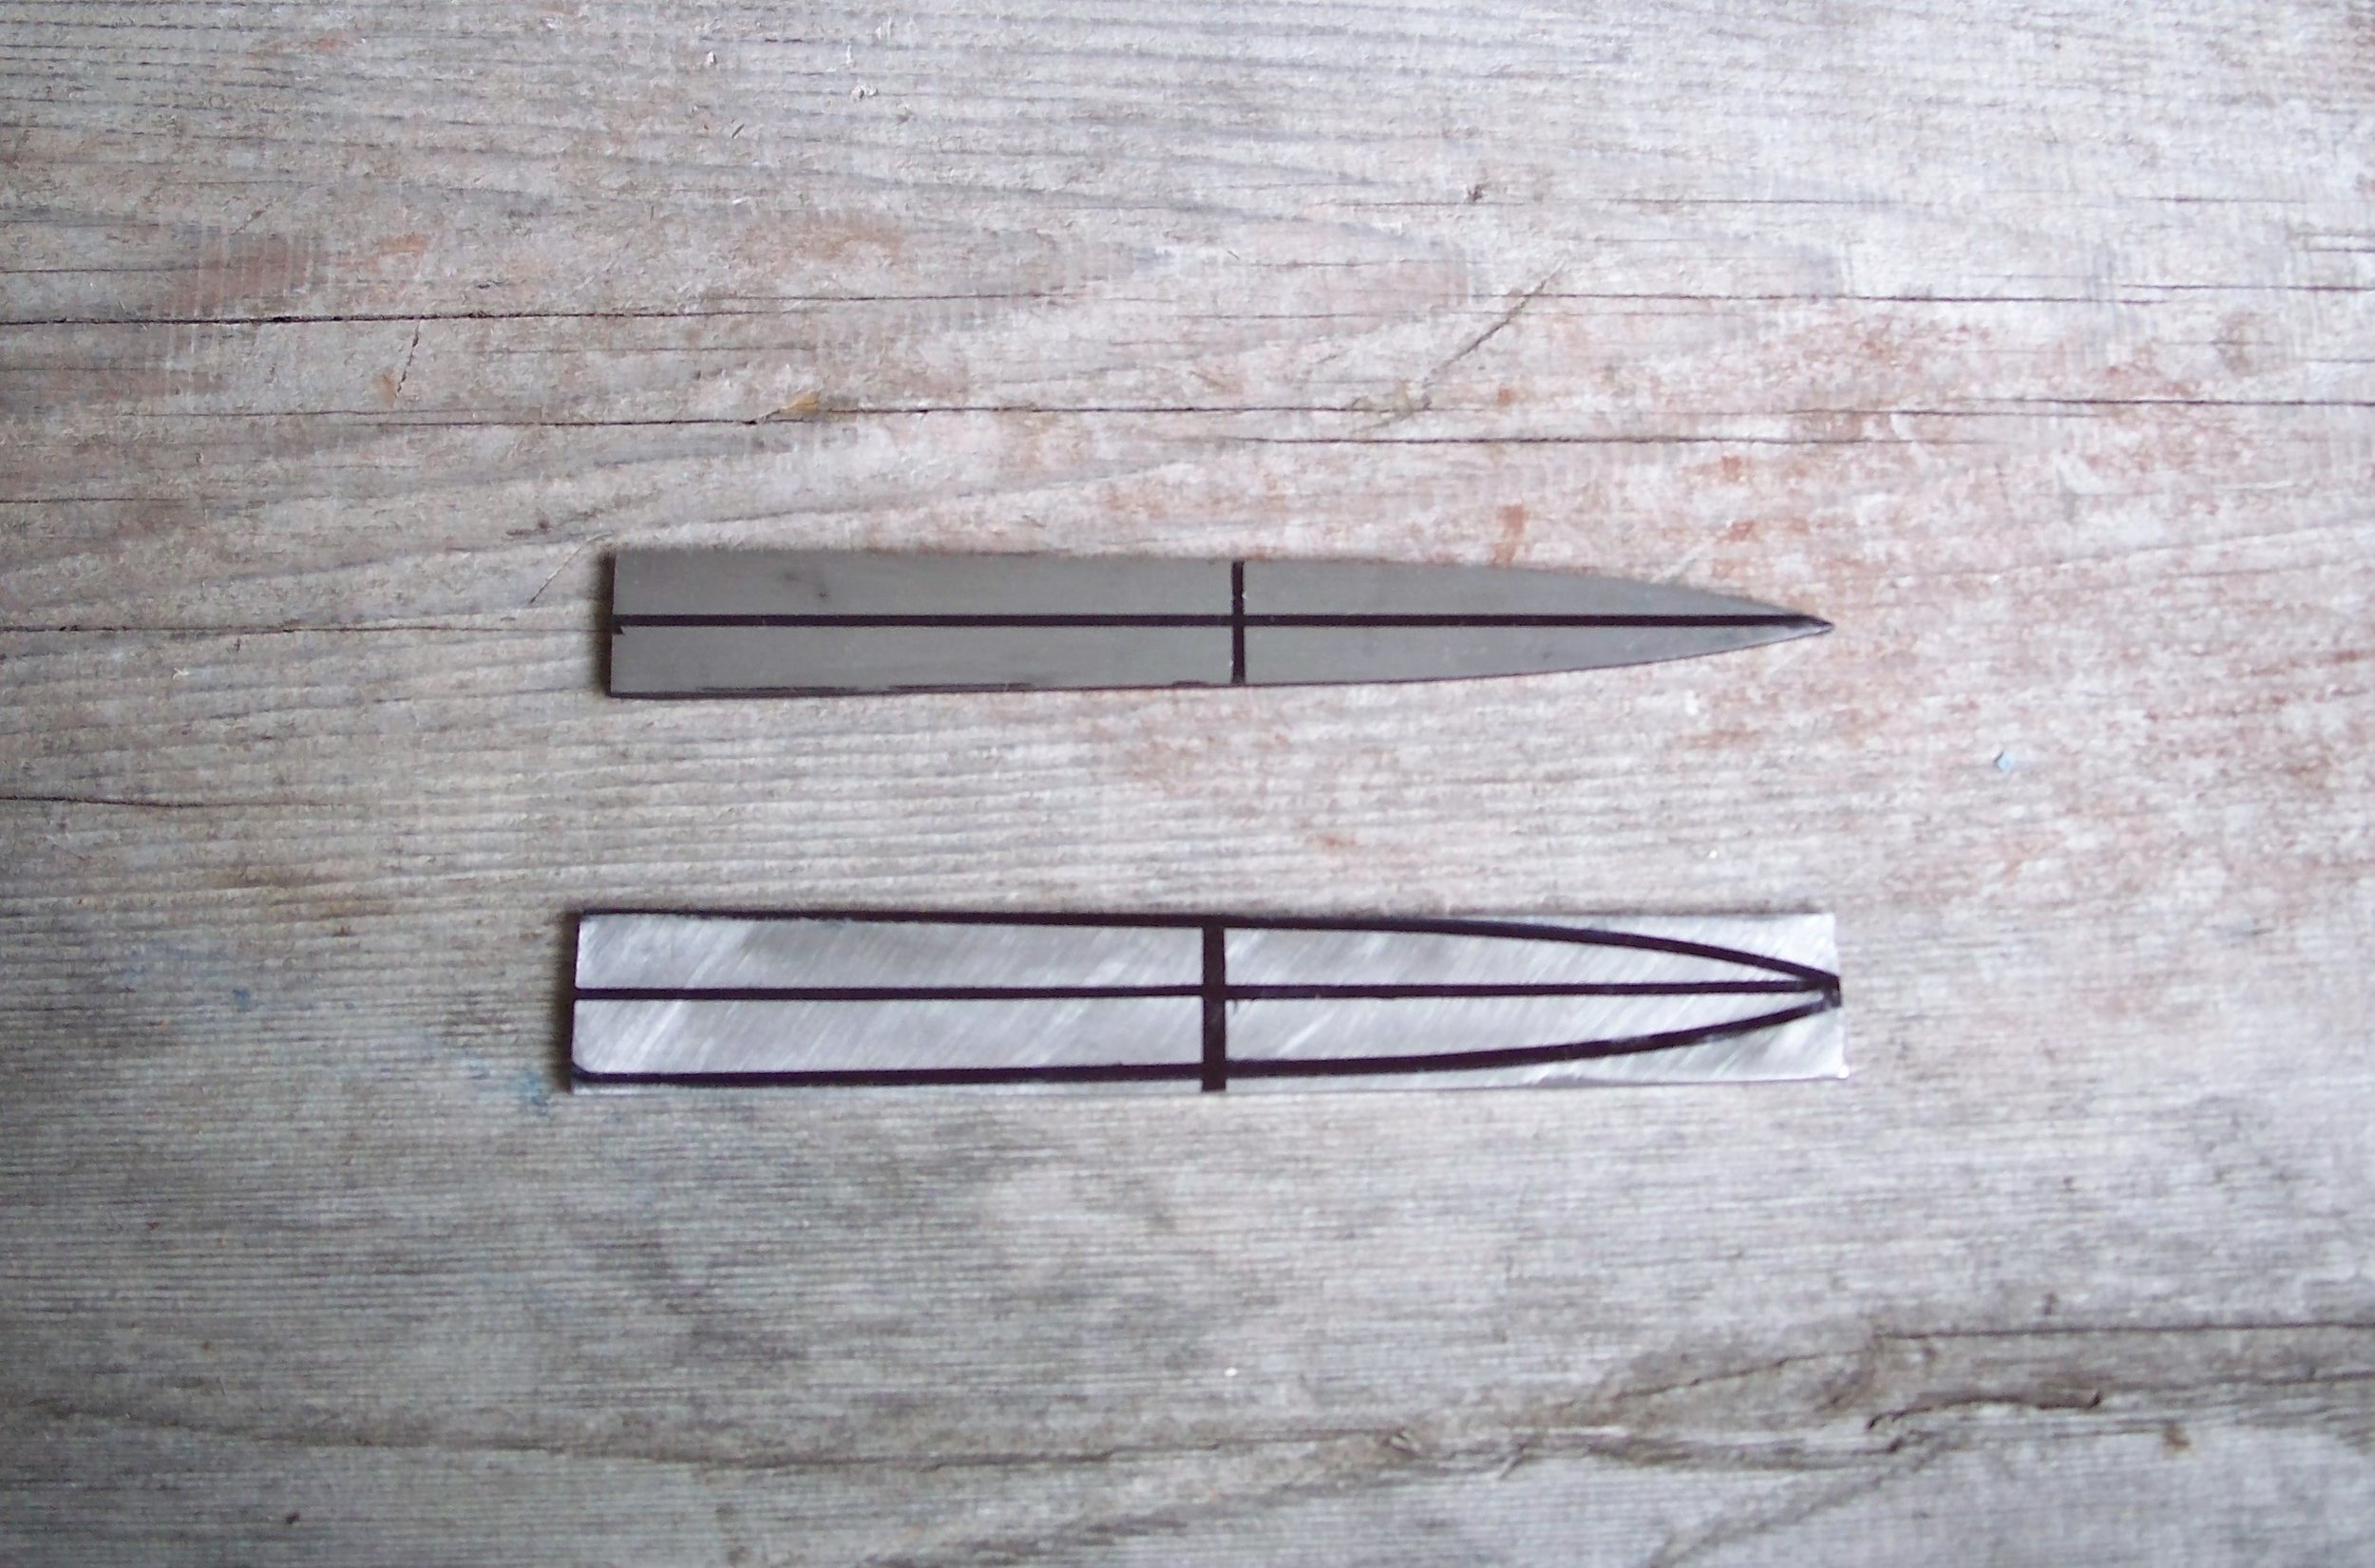 Hook knife blanks